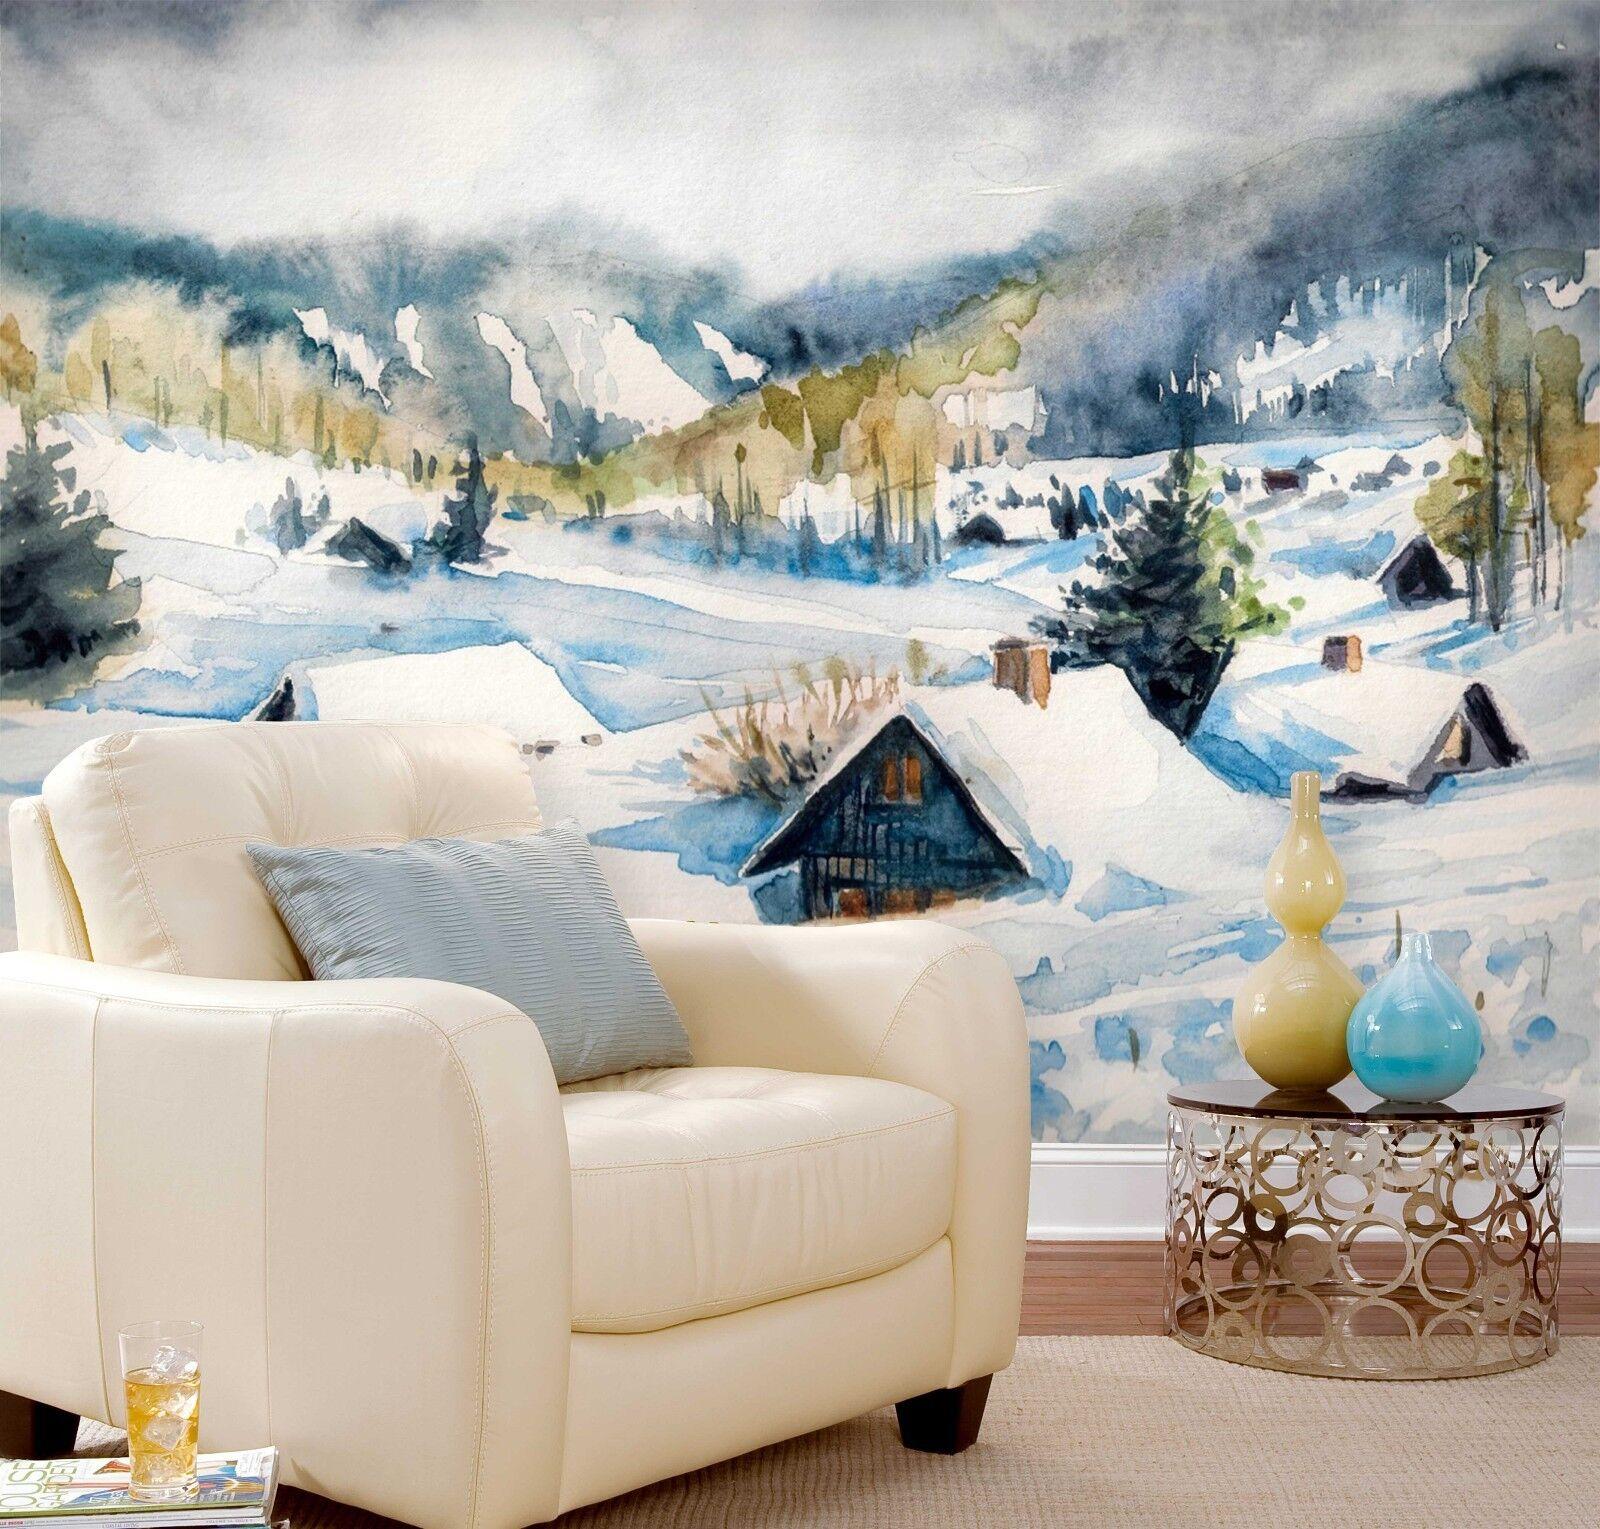 3D Winter Landschaft Freien 798 Tapete Wandgemälde Tapeten Bild Familie DE Lemon  | Genial  | Hochwertige Produkte  | Einfach zu spielen, freies Leben